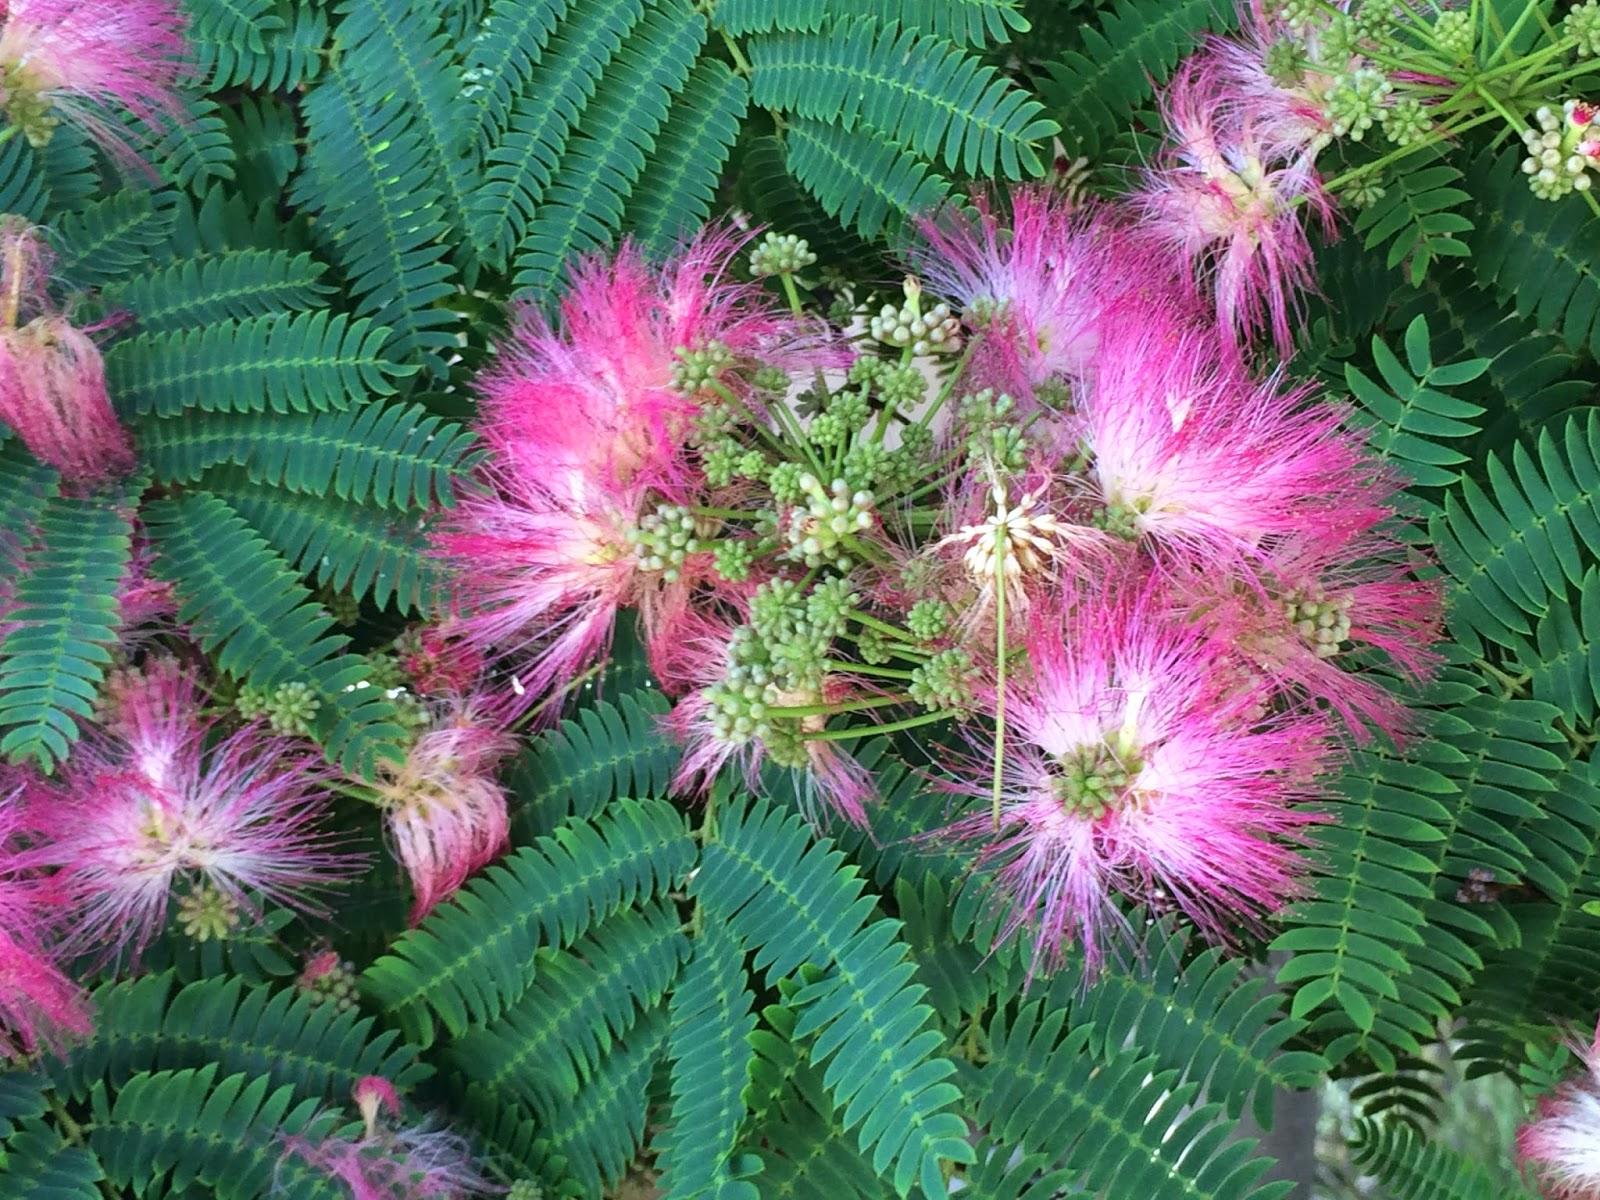 Trees Of Santa Cruz County Albizia Julibrissin Rosea Rosea Silk